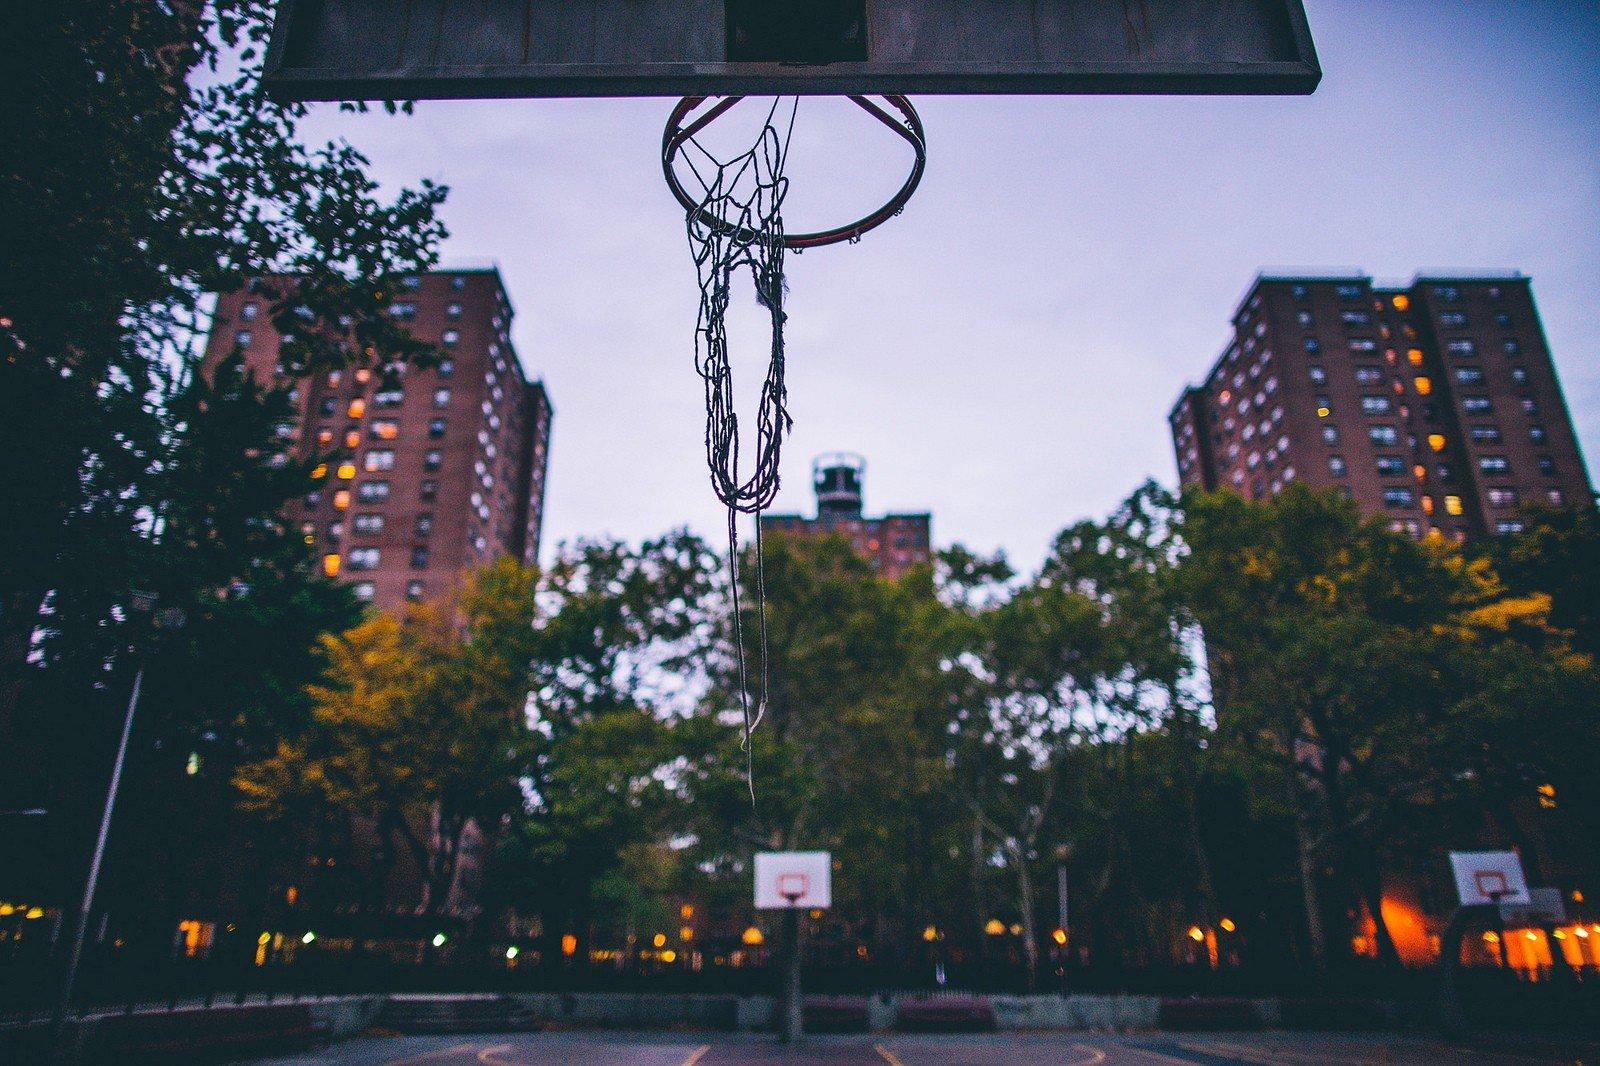 Basketball Court Wallpapers - WallpaperSafari